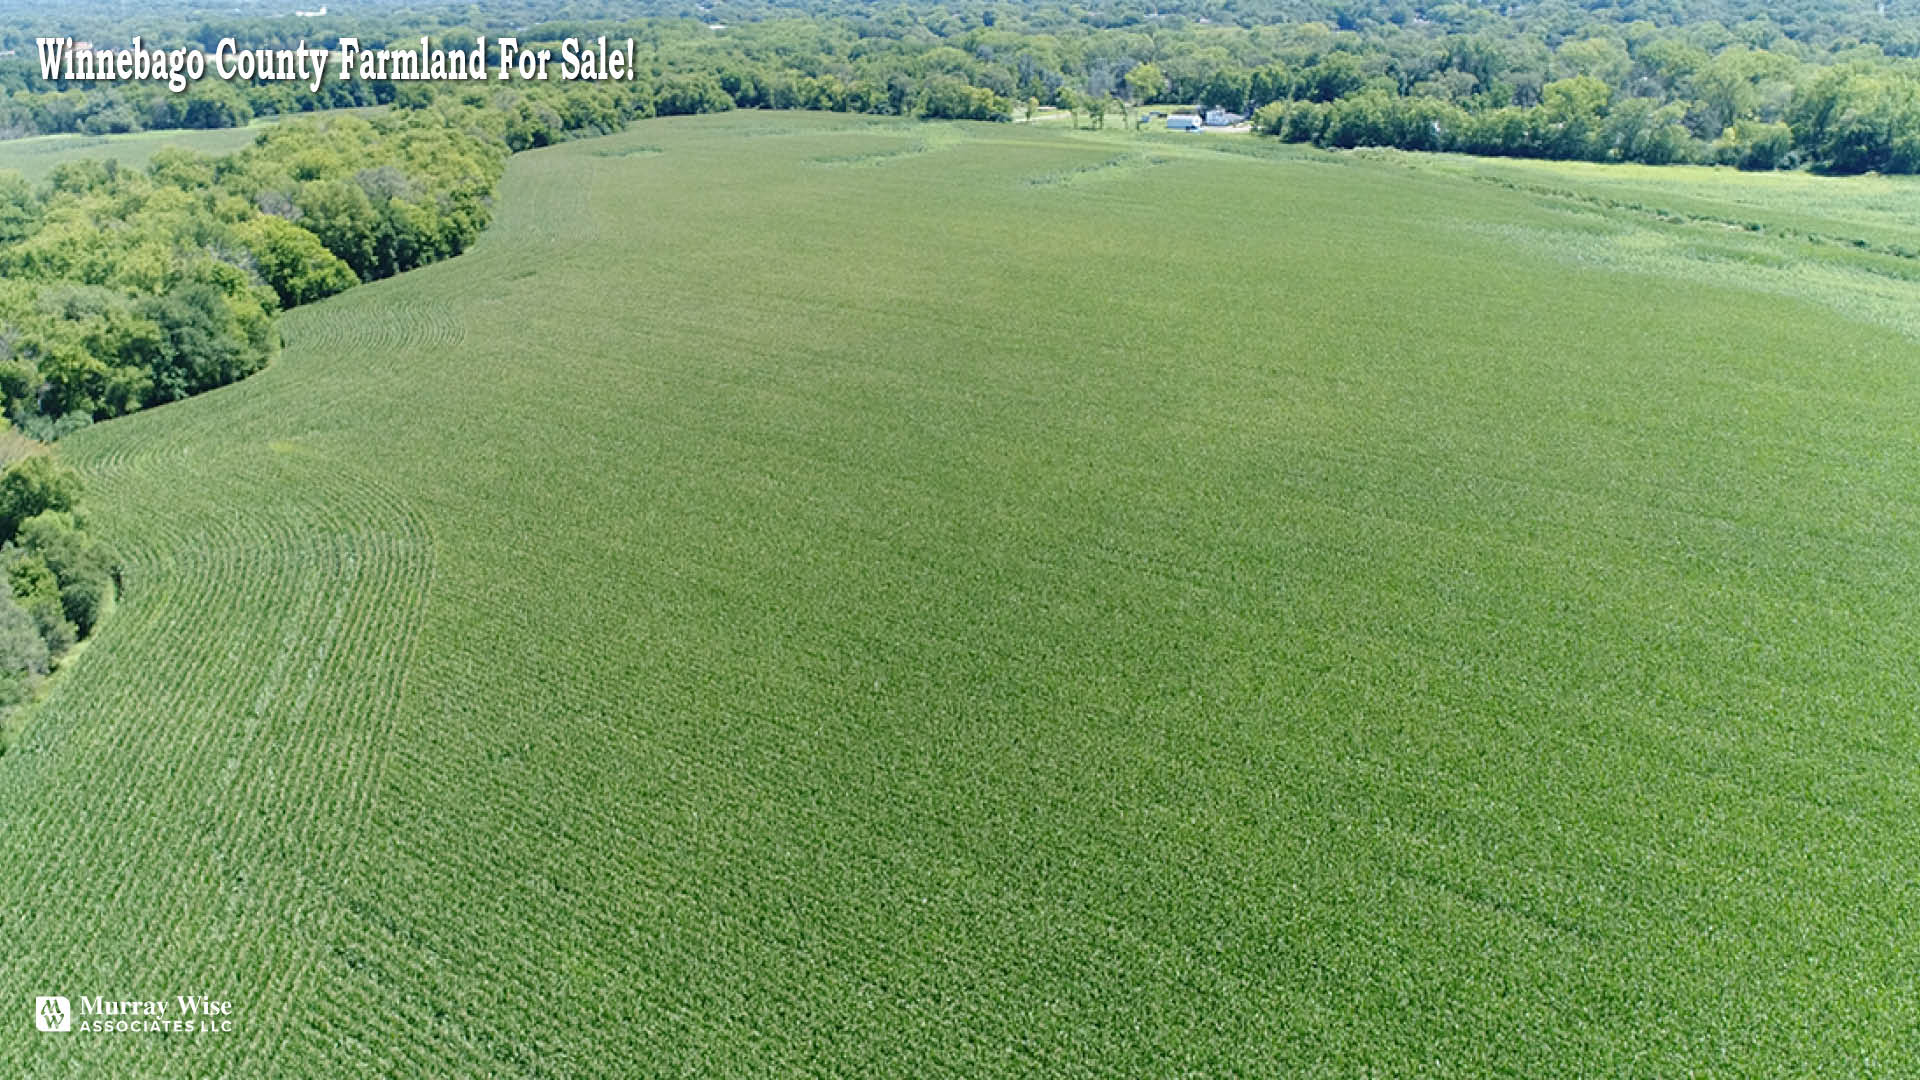 New ListingWinnebago County, IL - 154 Acres